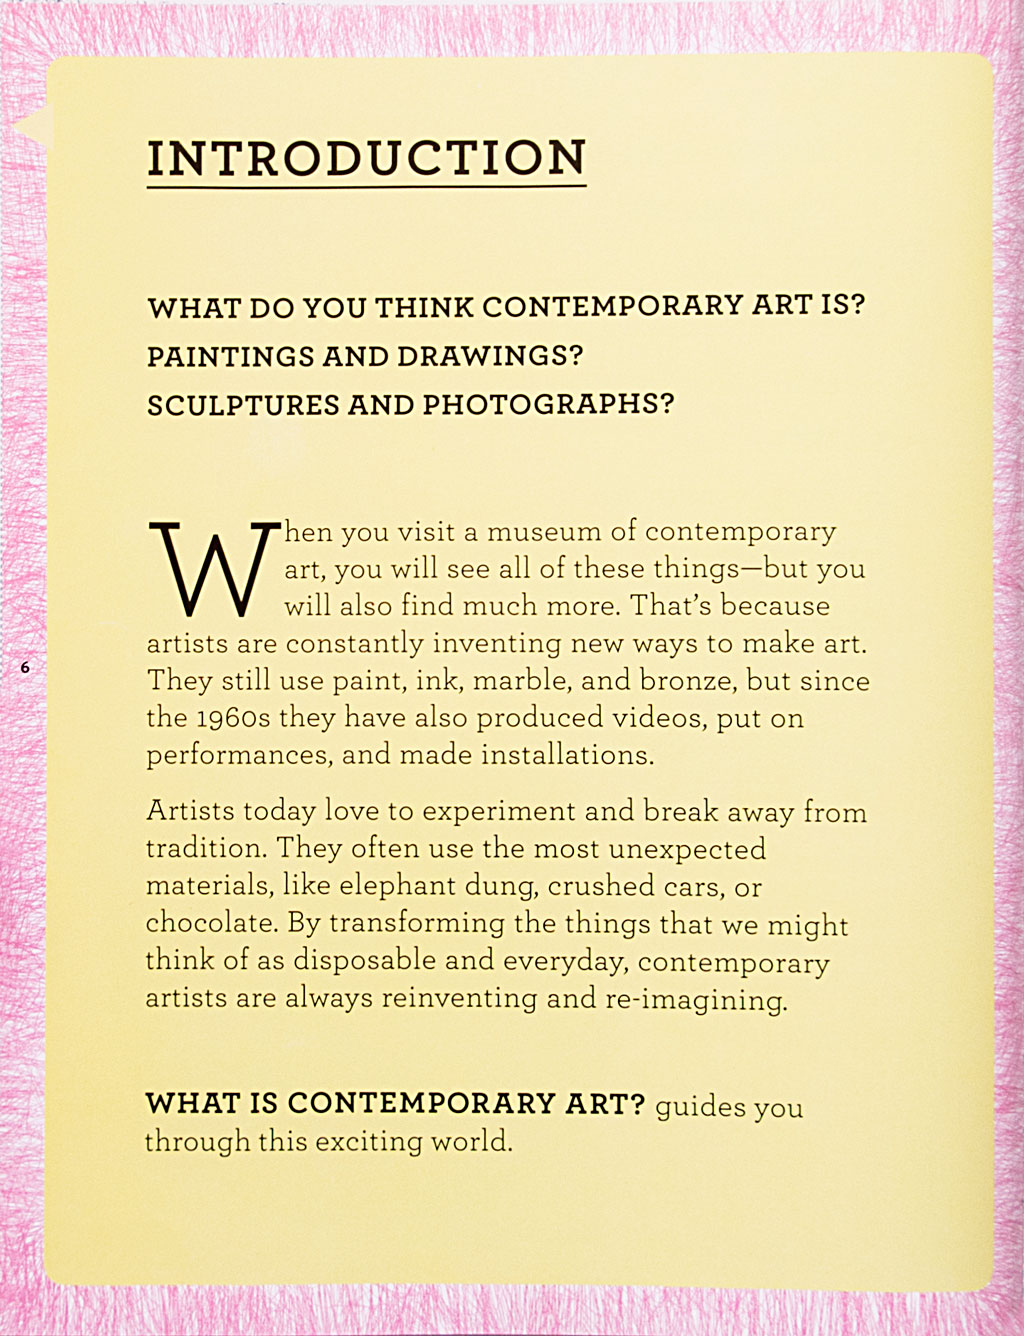 press-martin-azua-contemporary-art-3